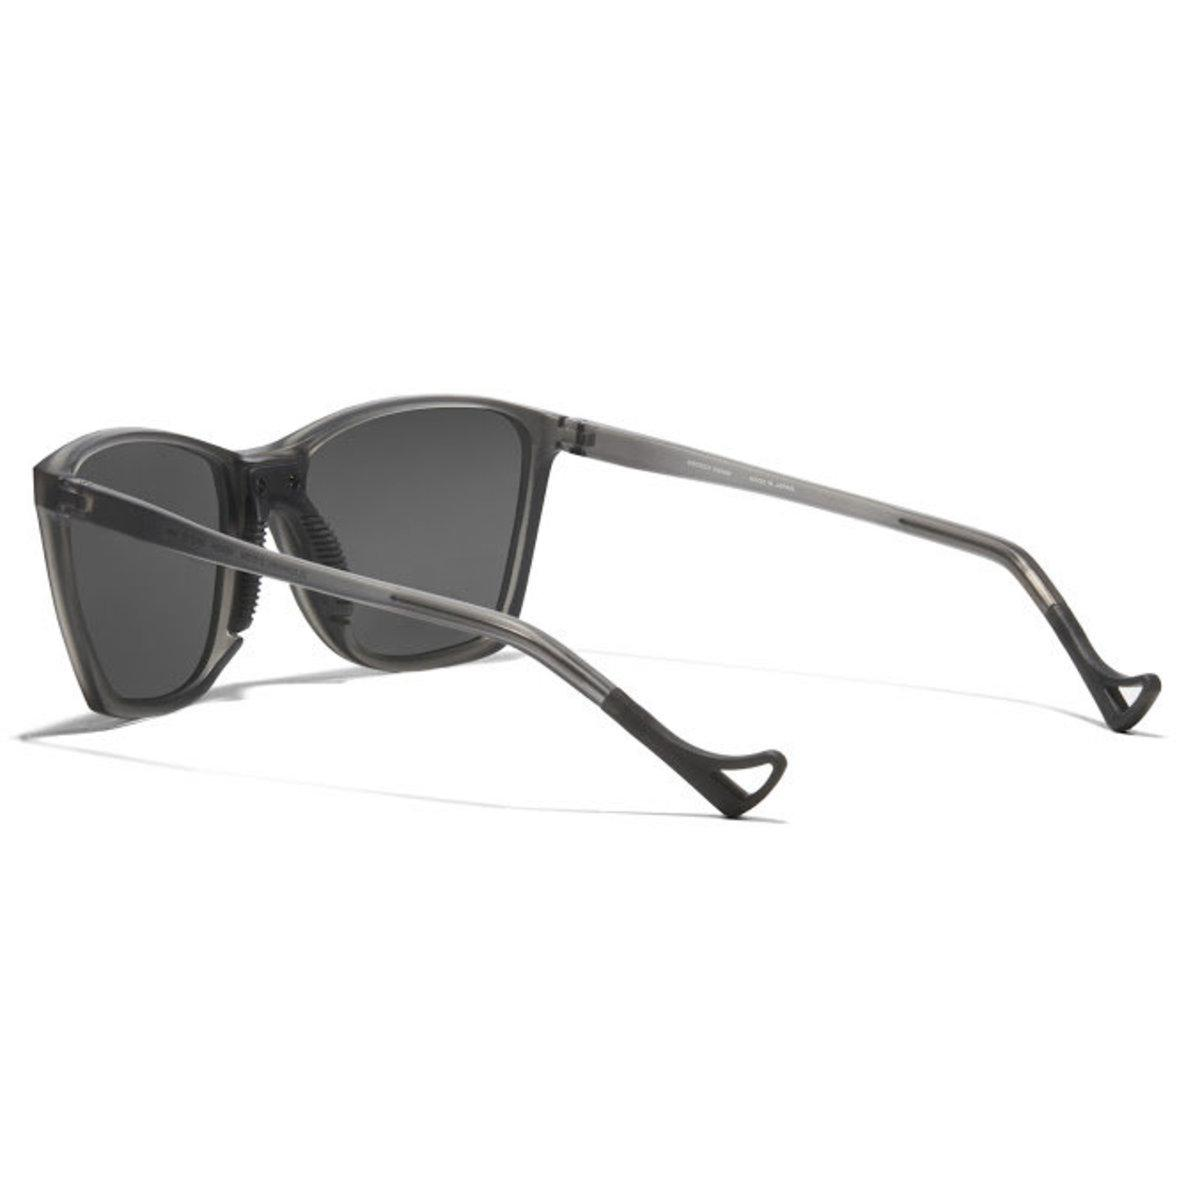 8bbf930020 Lyst - District Vision Keiichi Standard Running Sunglasses in Gray ...